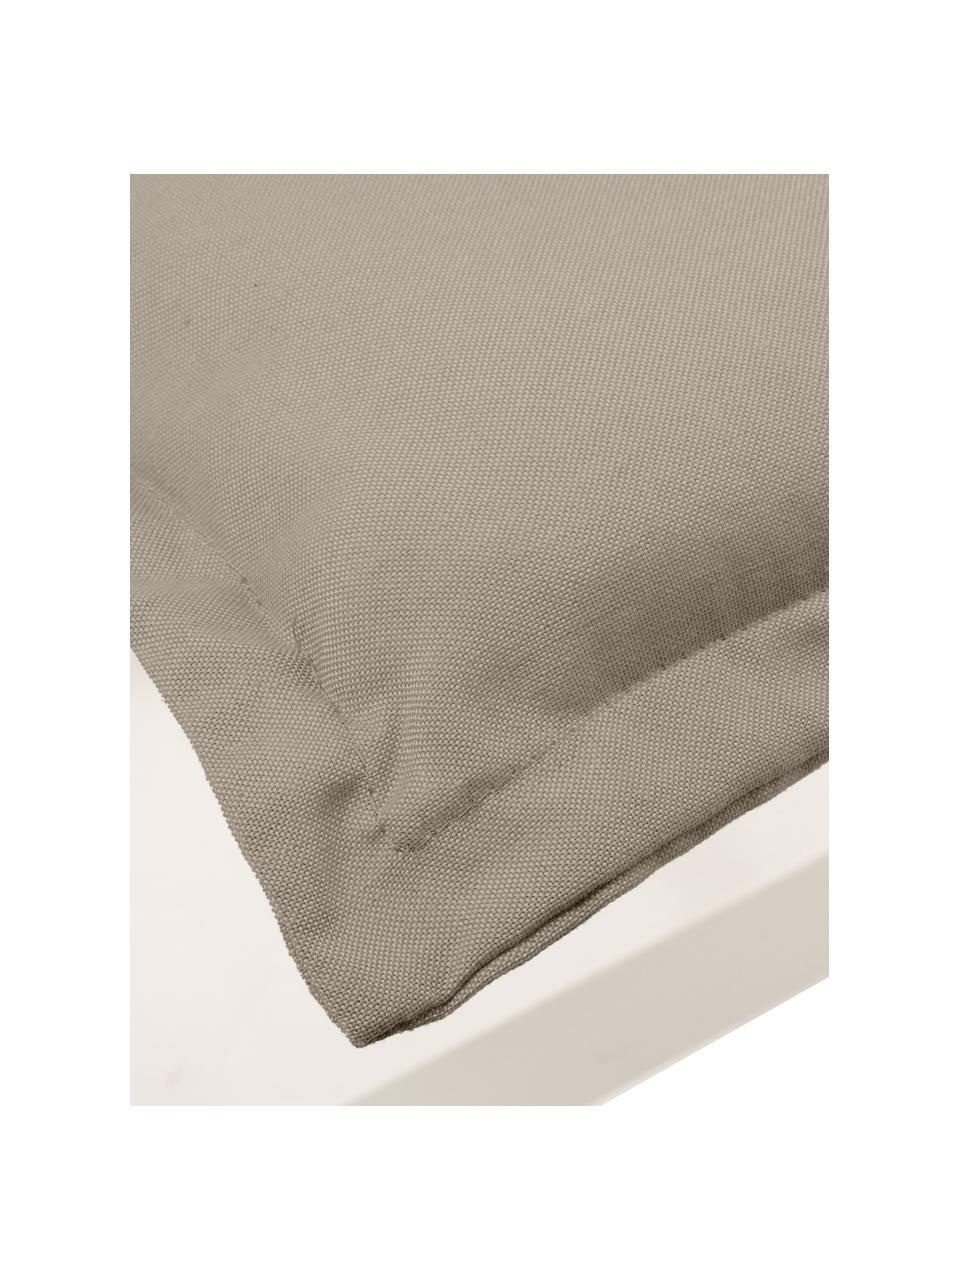 Cuscino sedia con schienale alto Panama, Rivestimento: 50% cotone, 50% poliester, Color sabbia, Larg. 50 x Lung. 123 cm